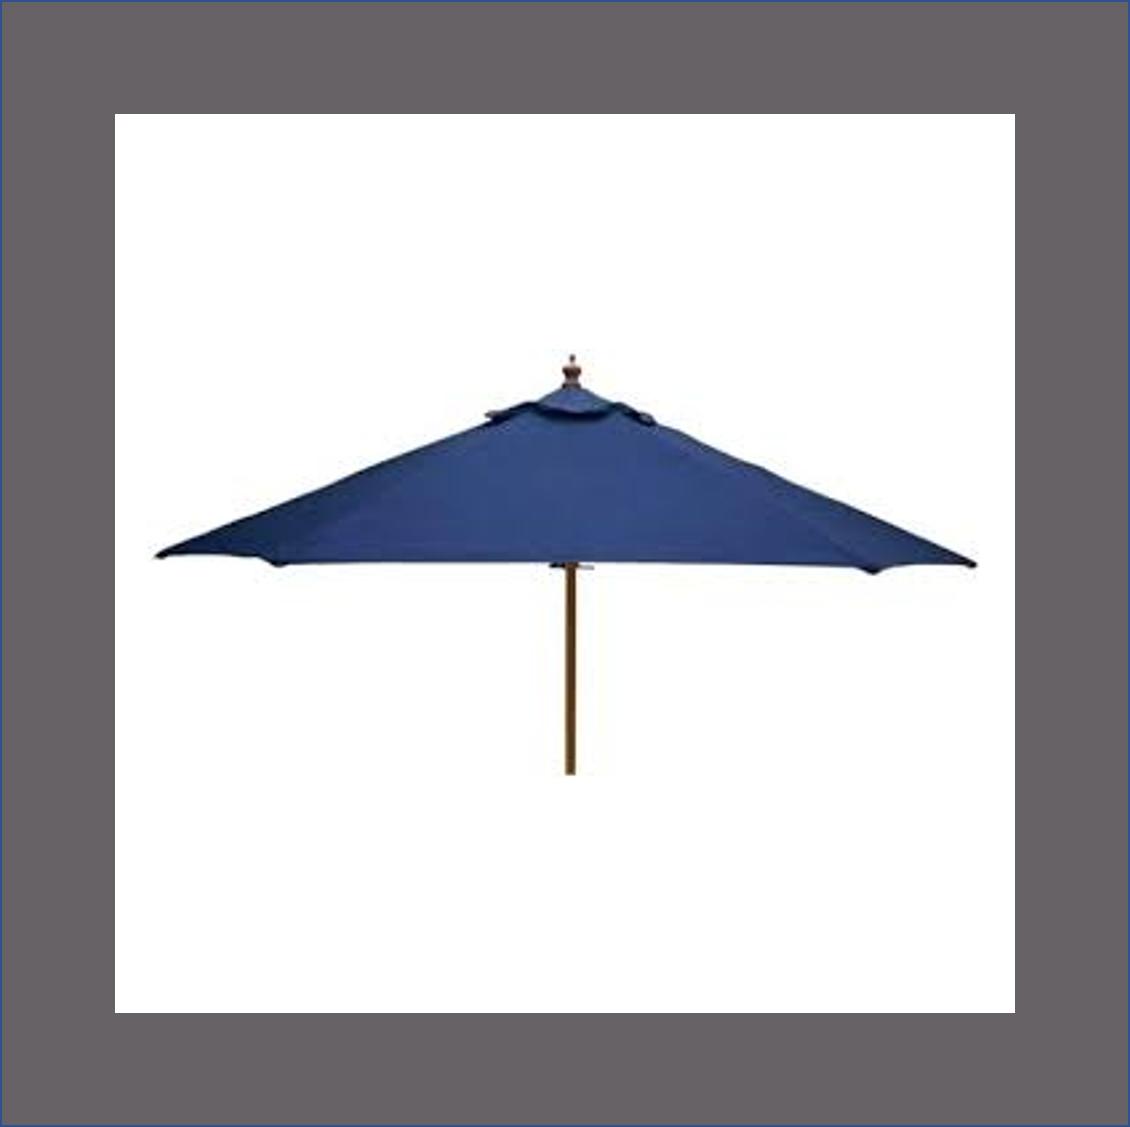 assorted-coloures-parasol-umbrellas